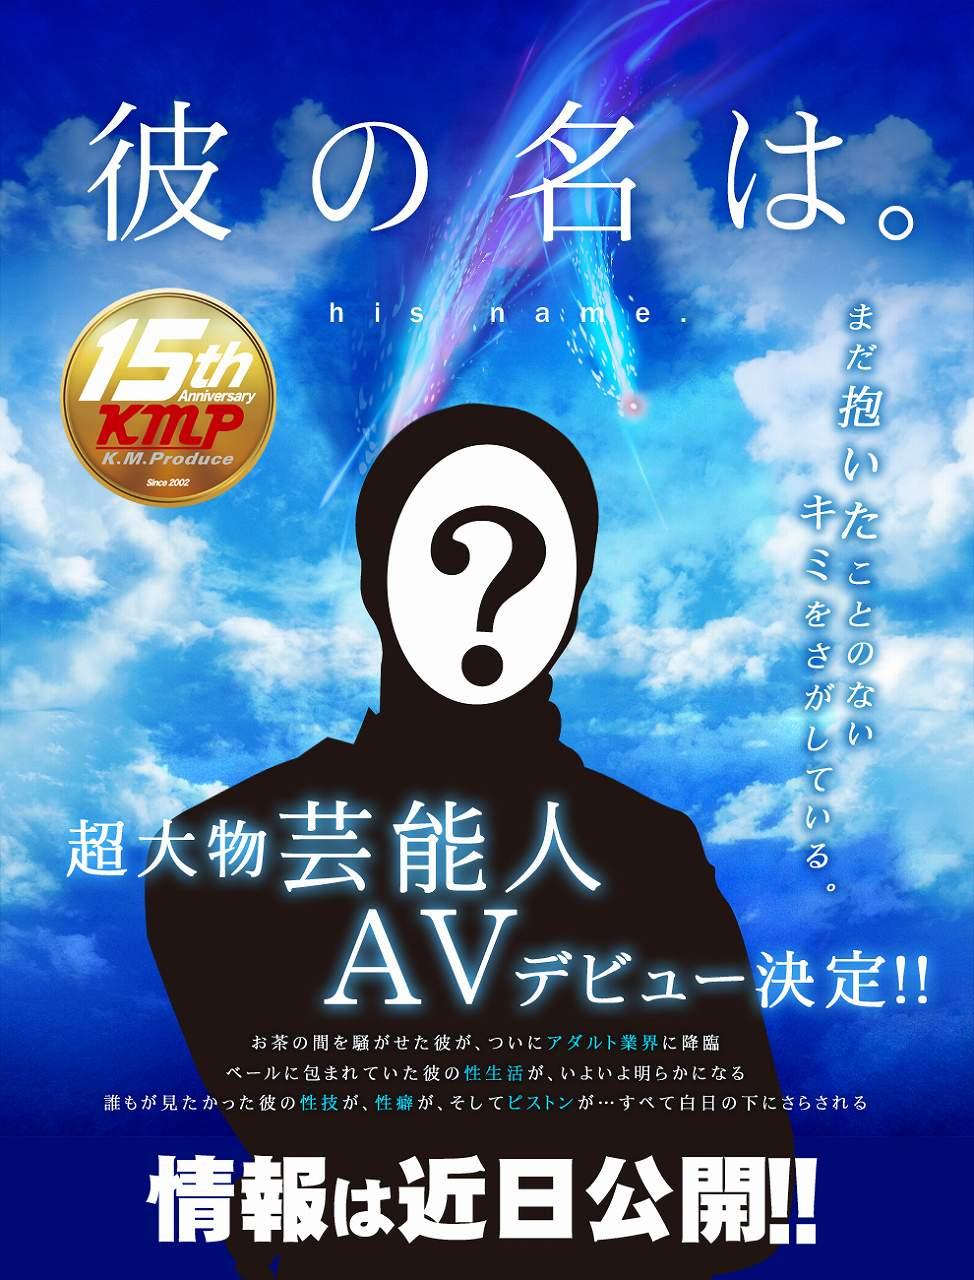 AV「彼の名は。」超大物芸能人AVデビュー決定!!